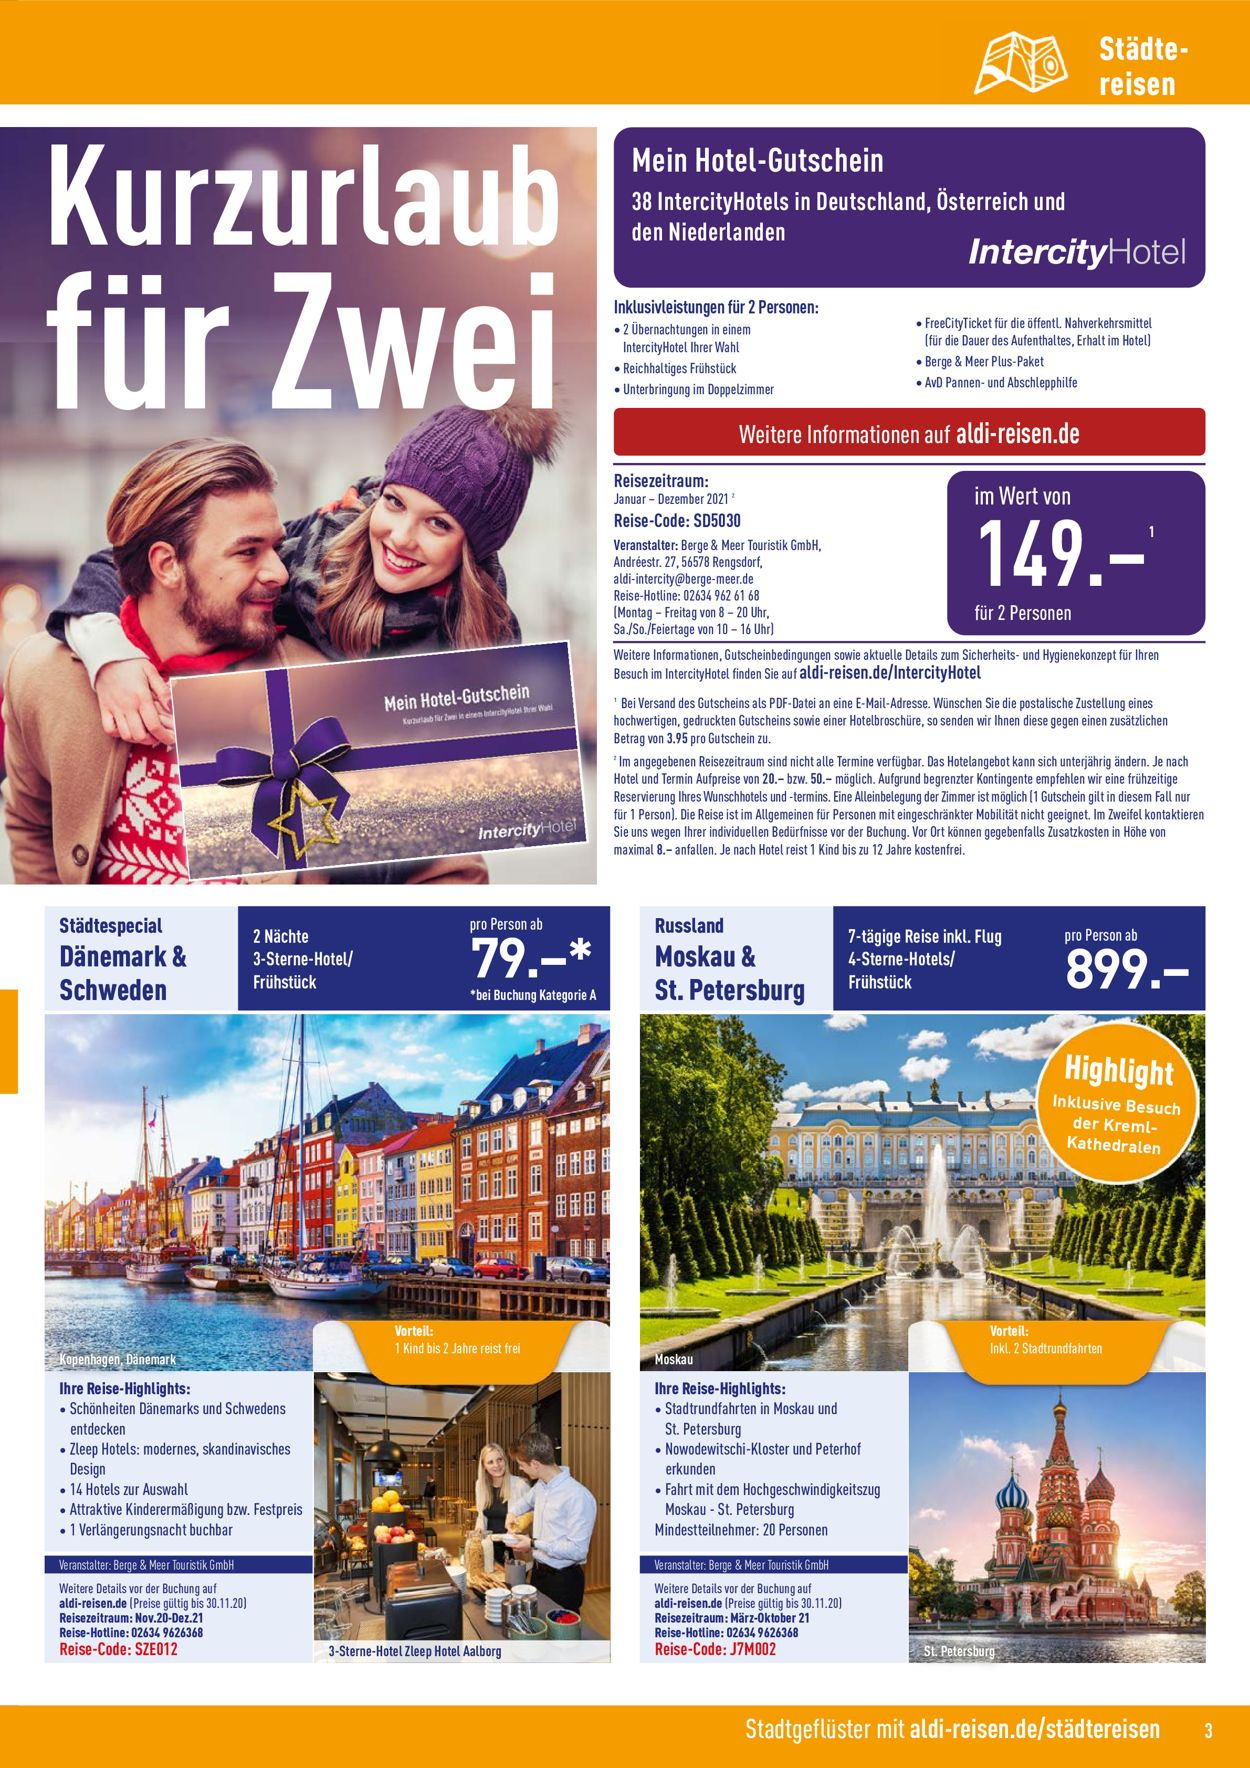 Aldi-Reisen.De Intercity Hotel 2021